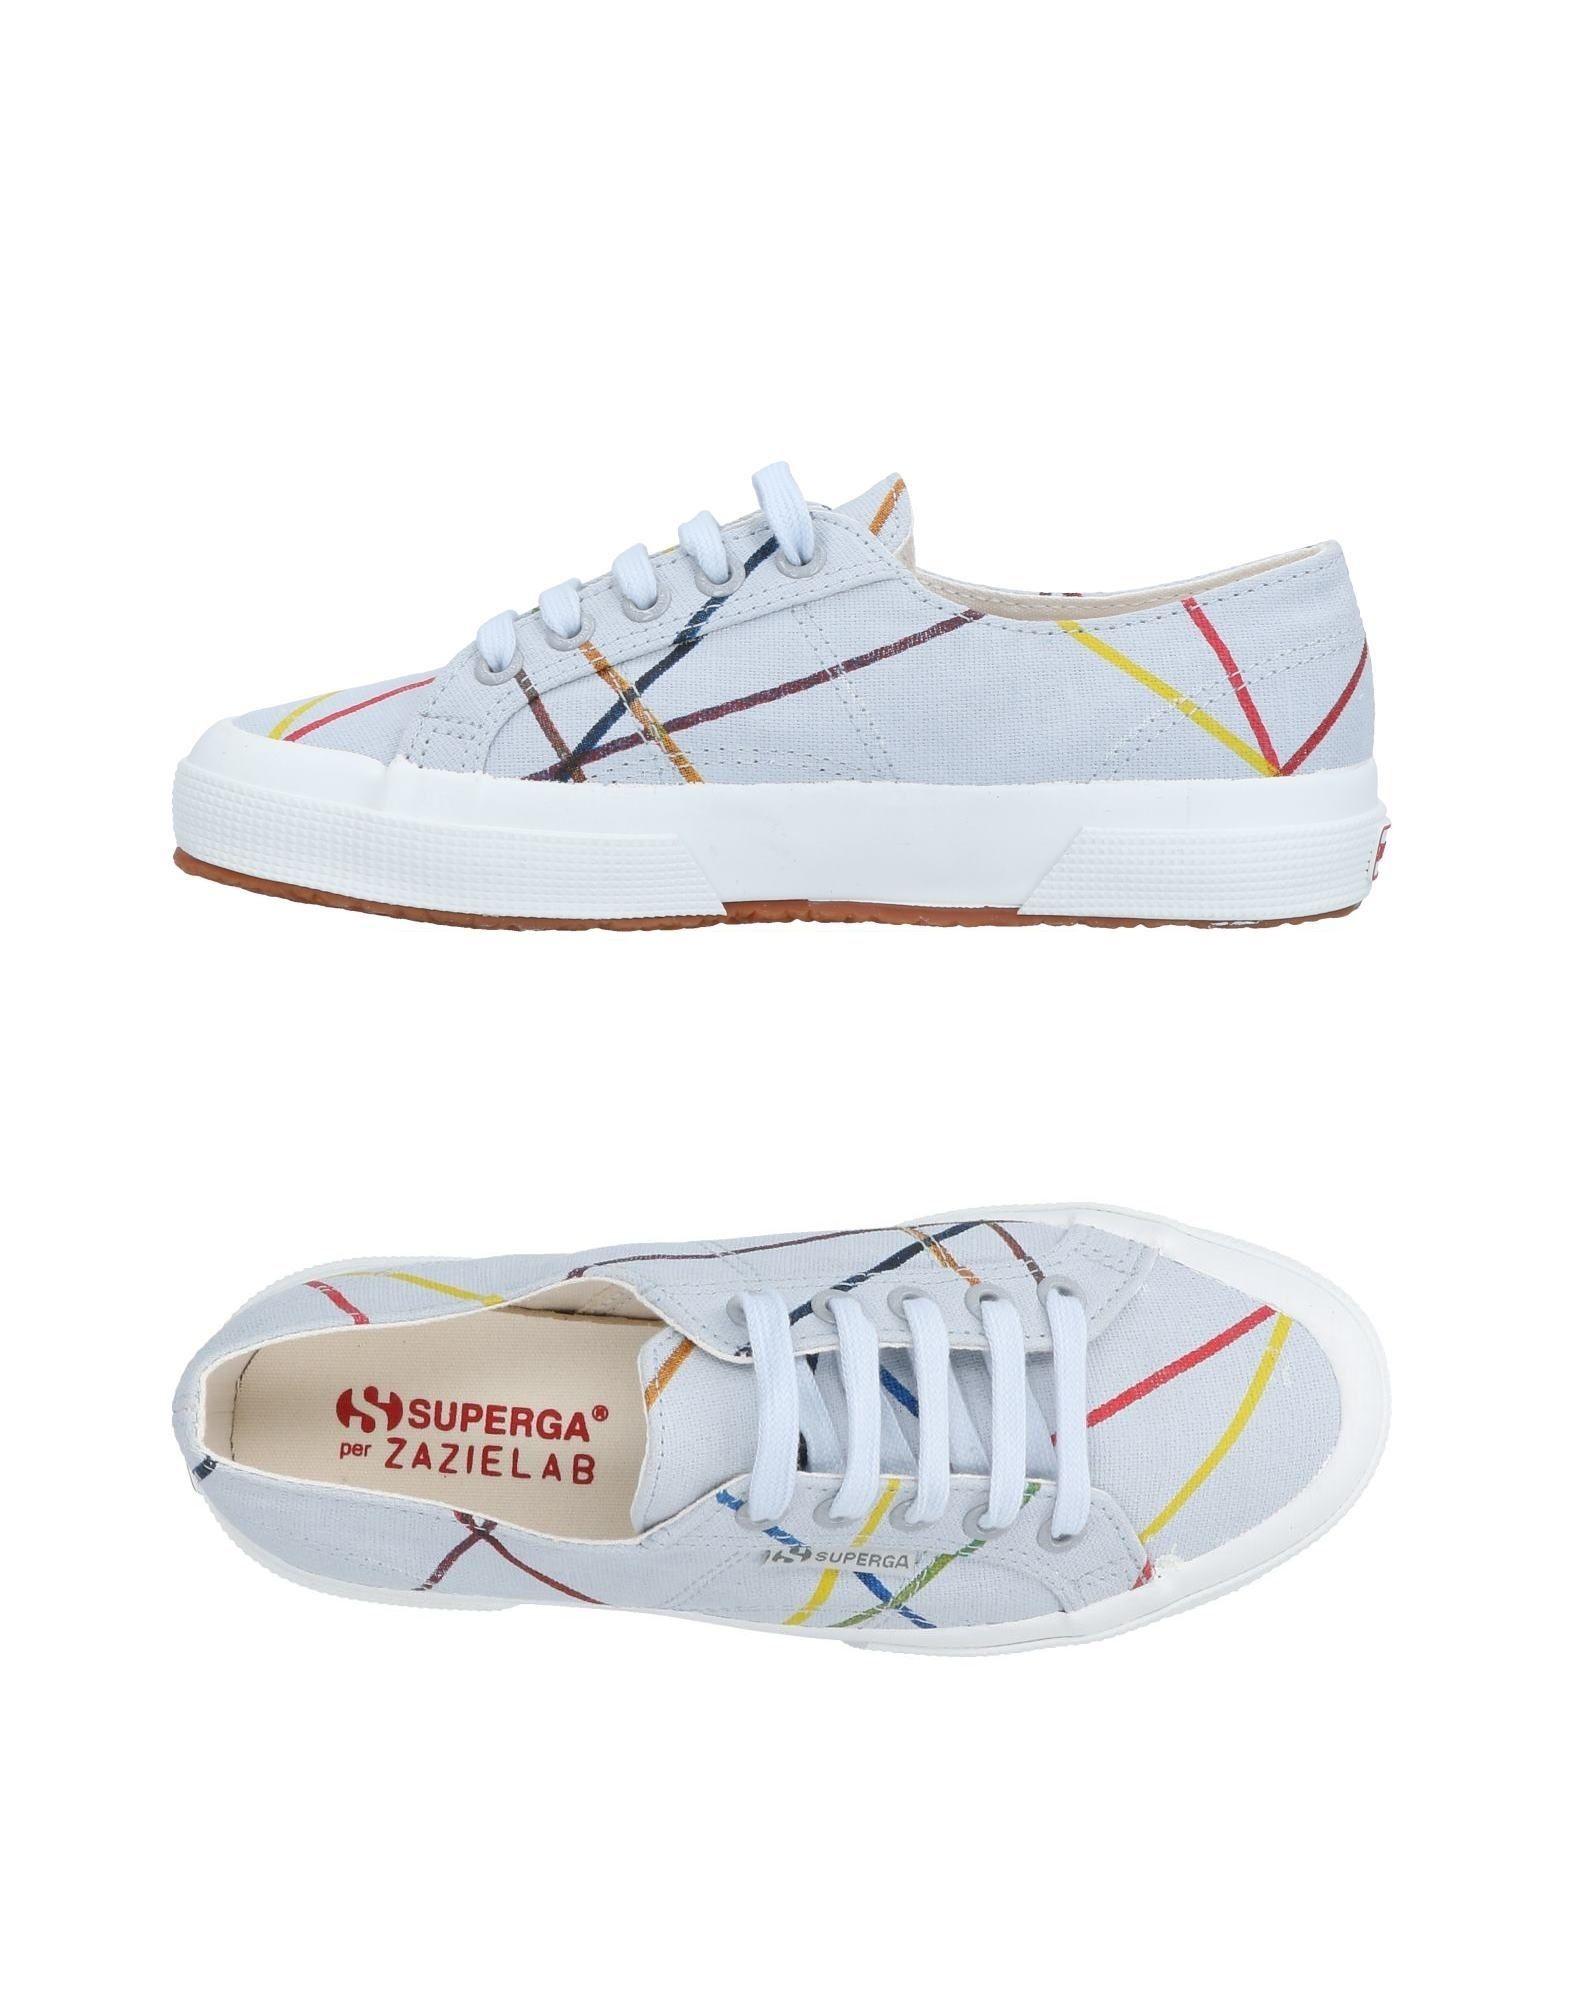 Superga® Sneakers Damen  11489836HR Gute Qualität beliebte Schuhe